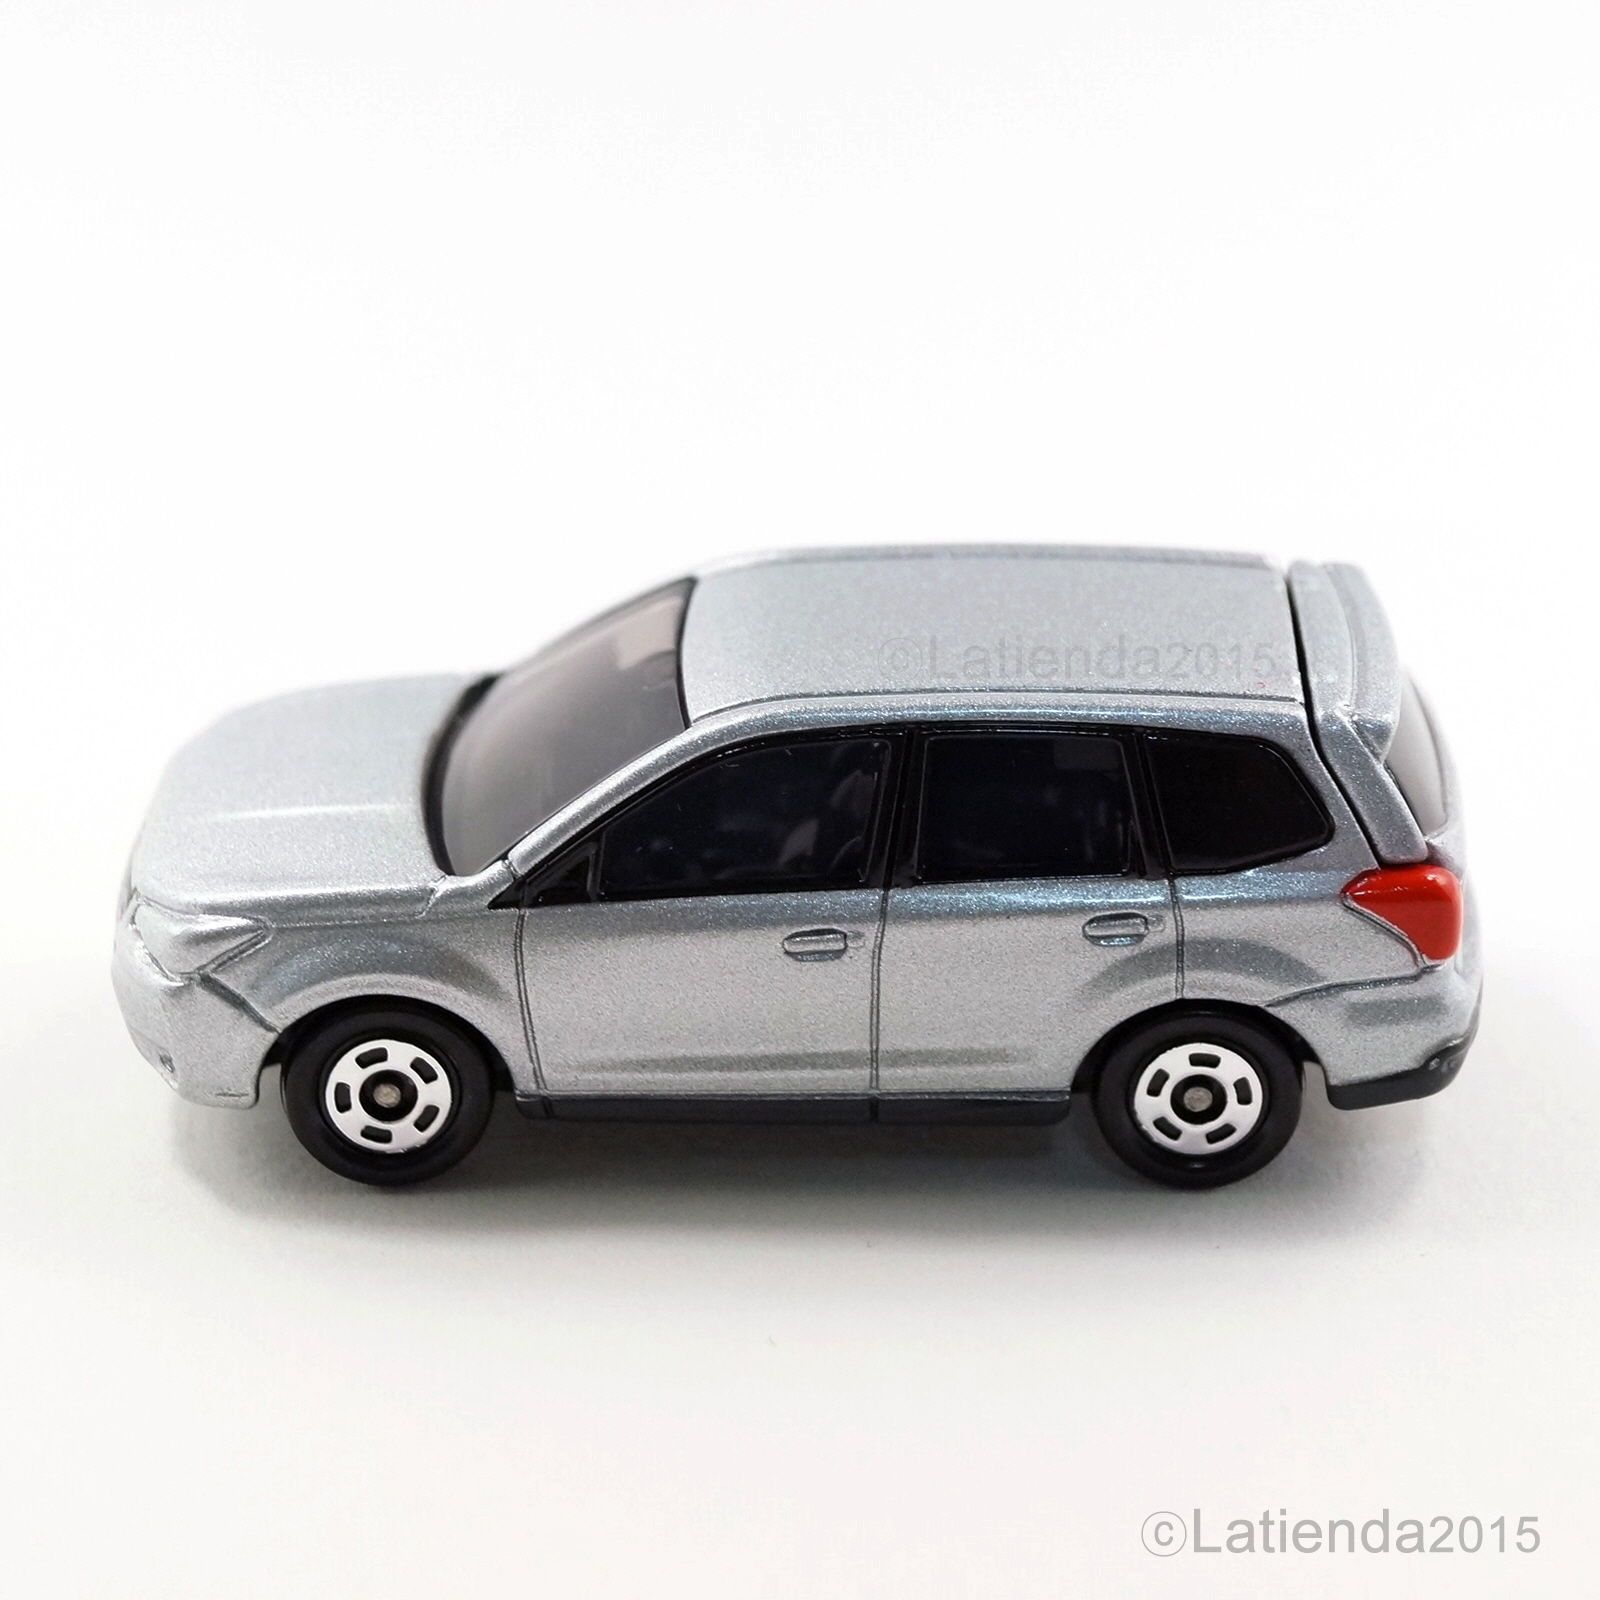 Honda car toys    Takara Tomy Tomica  Subaru Forester Diecast Car Toy